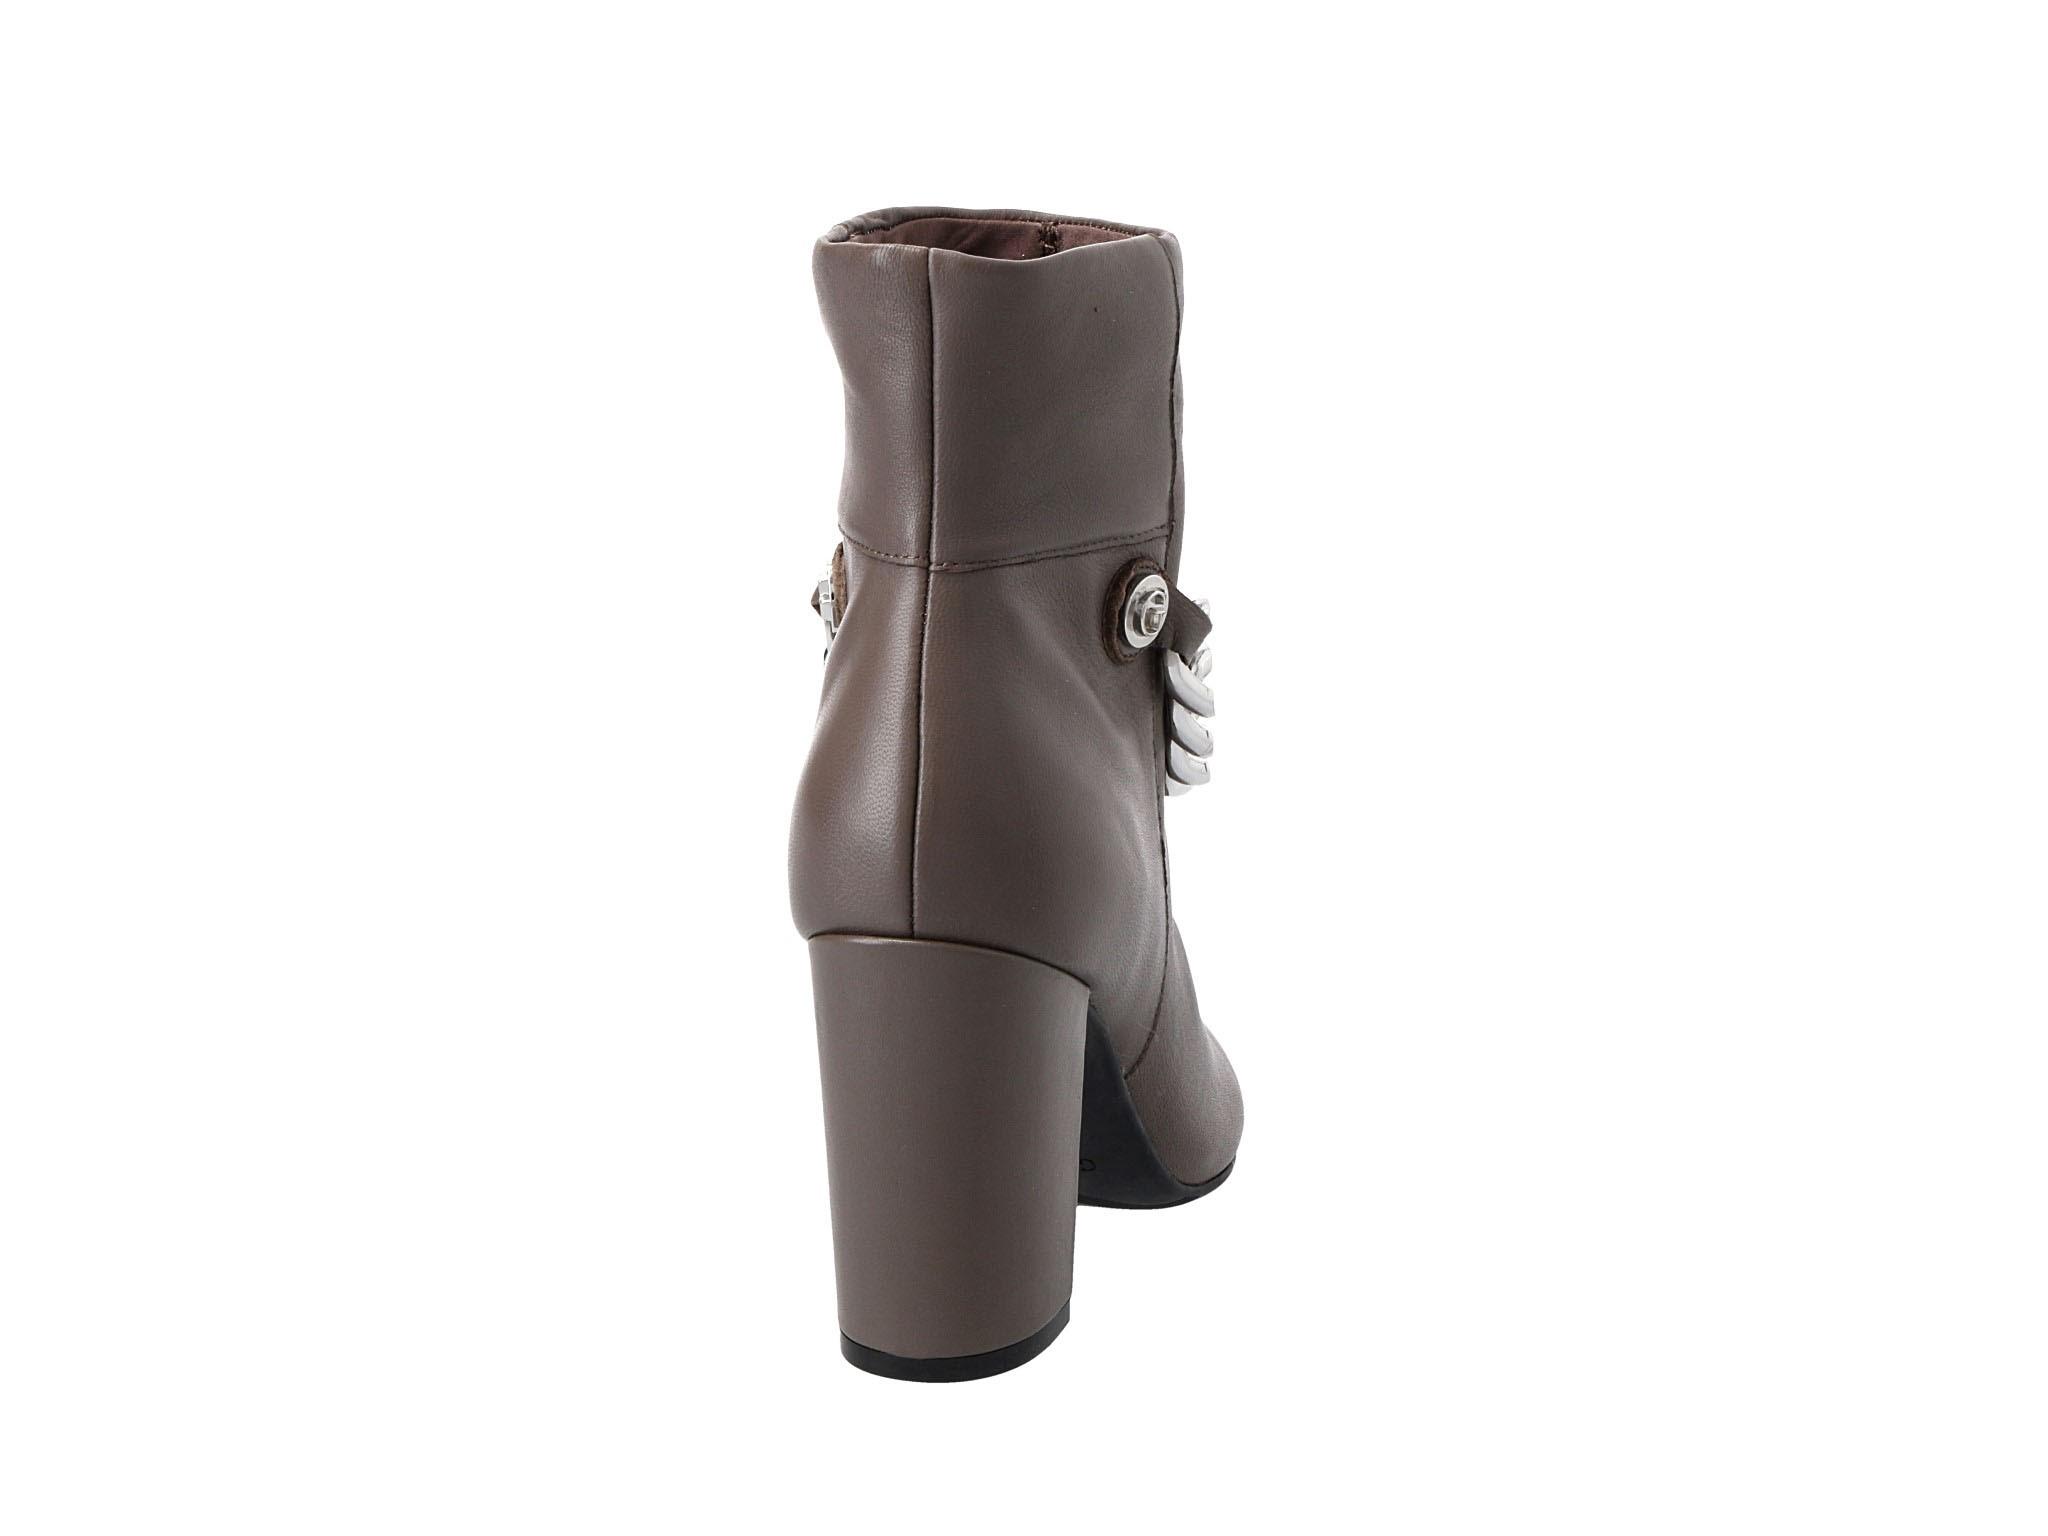 Stiefeletten GUESS - FLAKN4 LEA10 TAUPE - Boots - Stiefel und andere - Damenschuhe